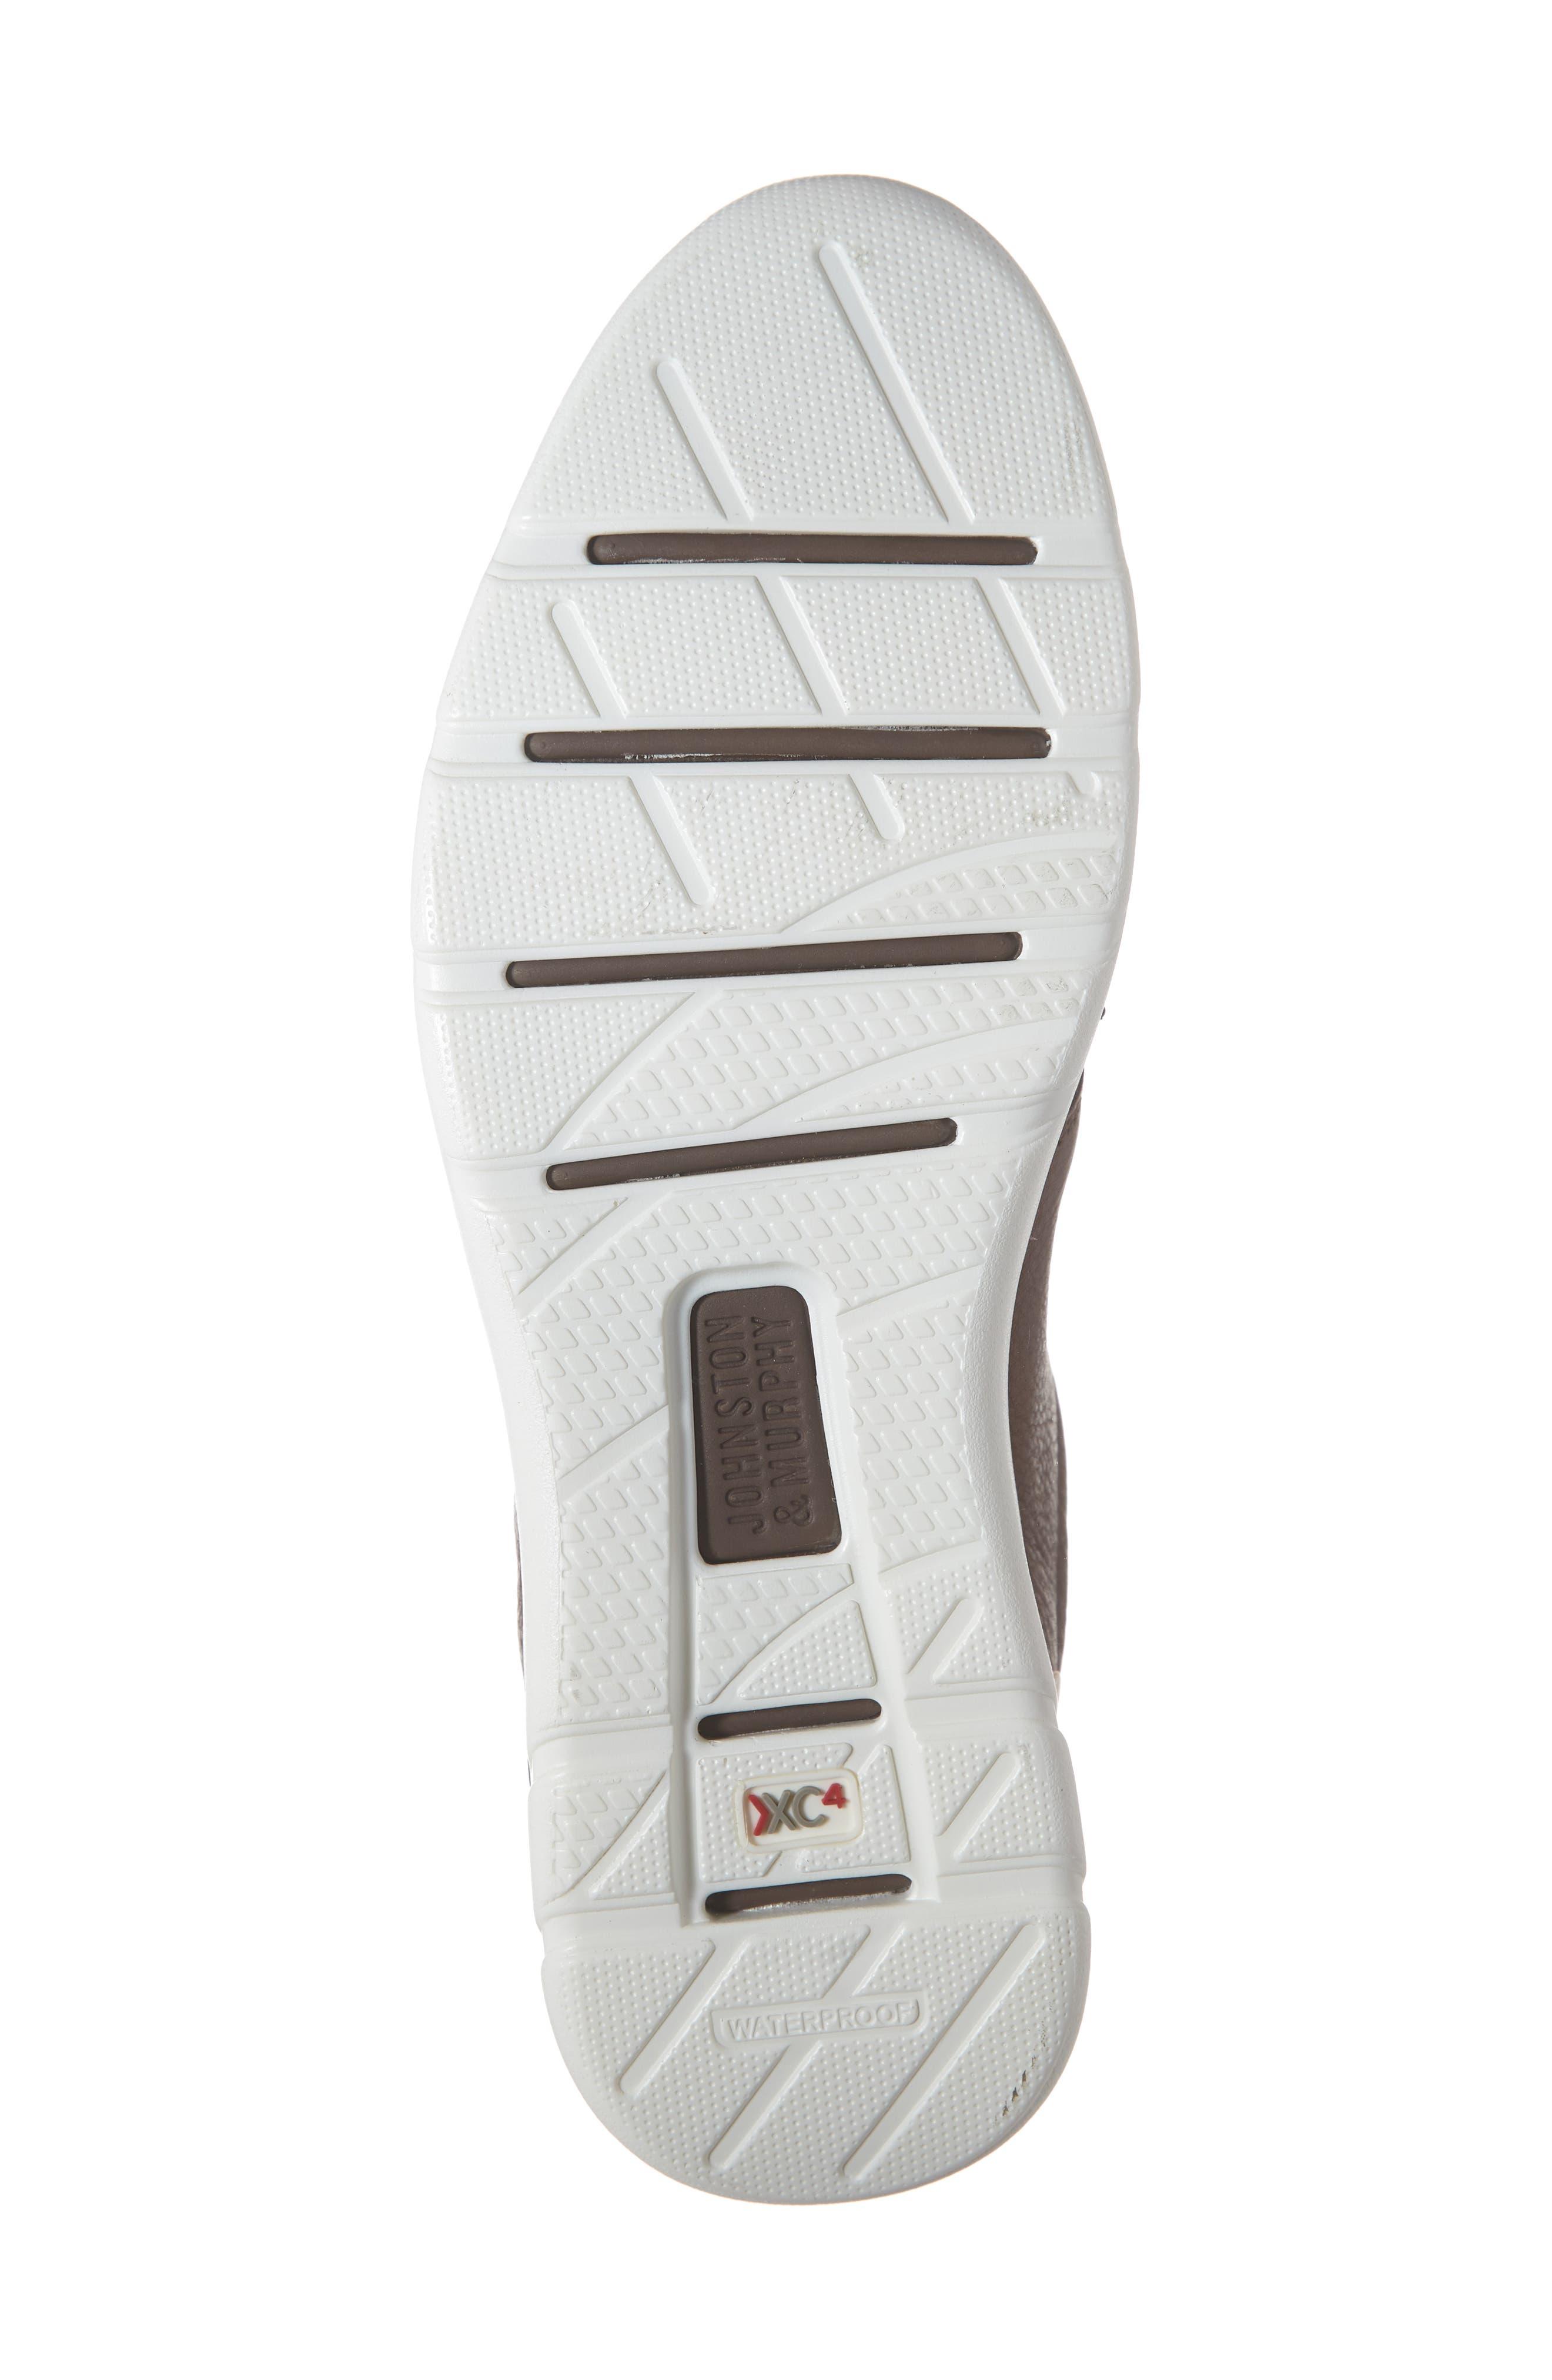 JOHNSTON & MURPHY, Prentiss XC4<sup>®</sup> Waterproof Low Top Sneaker, Alternate thumbnail 6, color, MAHOGANY LEATHER